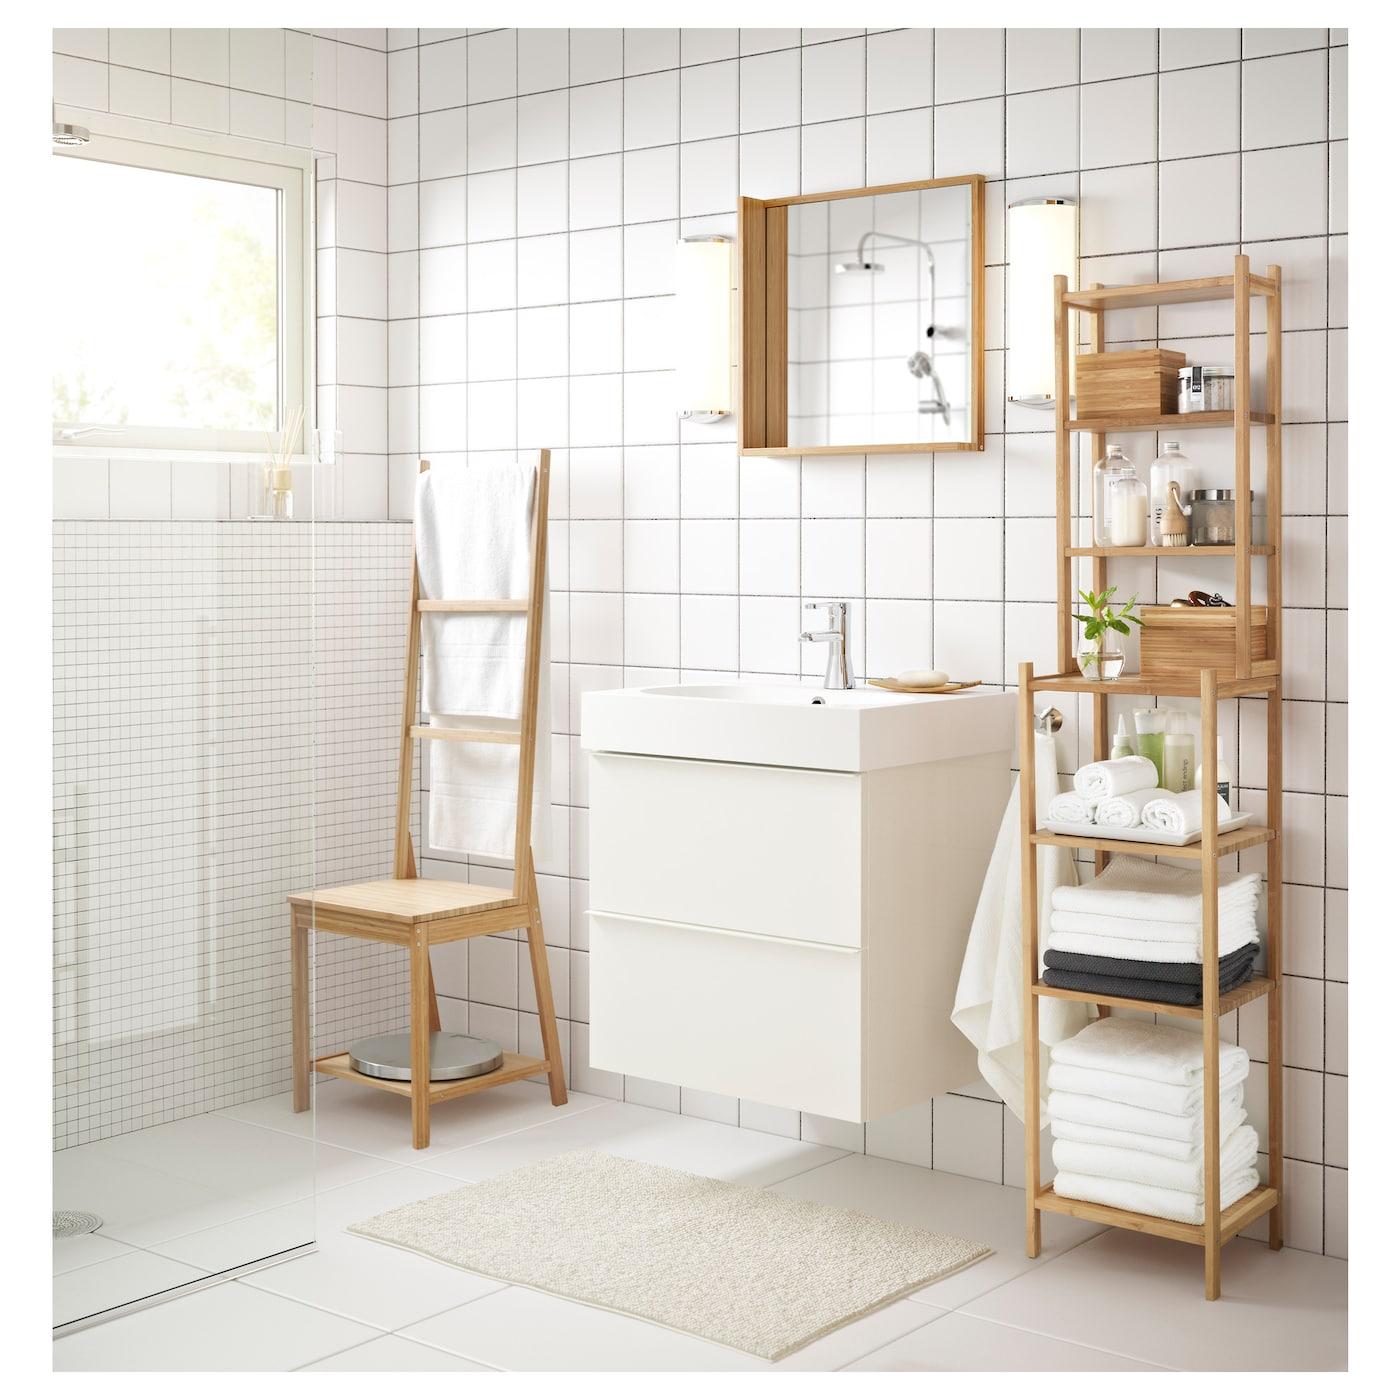 IKEA RÅGRUND Towel Rack Chair Bamboo Is A Hardwearing Natural Material.